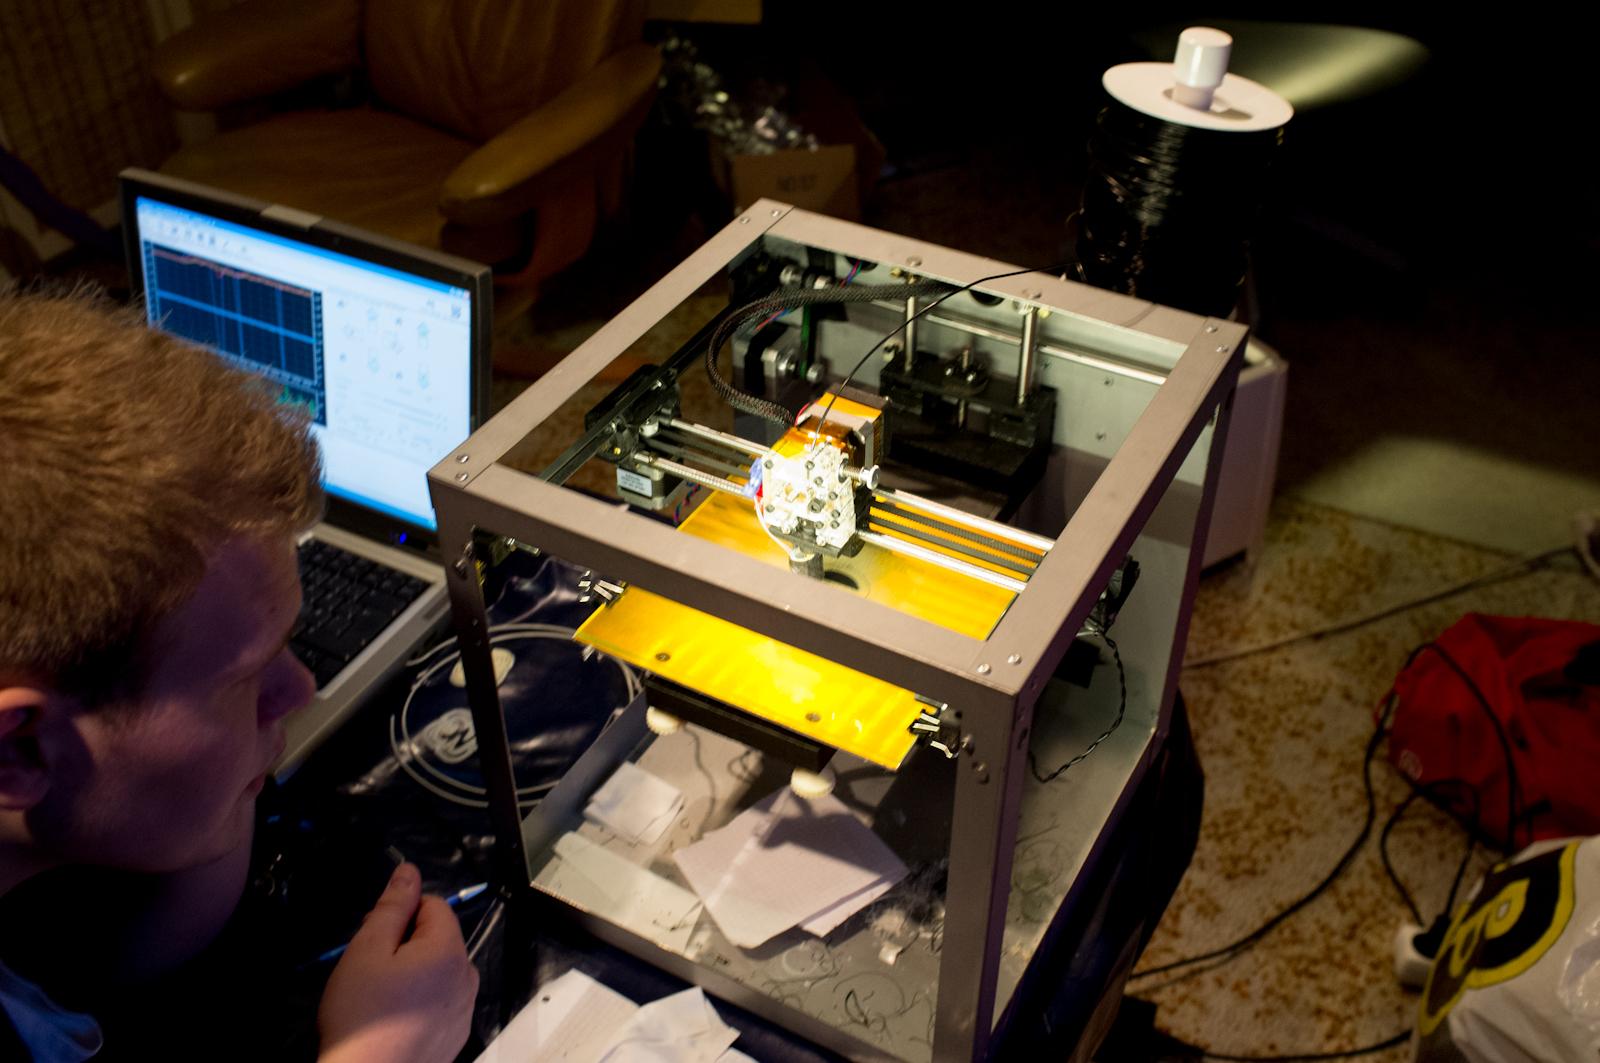 Gunnar inspecting the SD3 printer